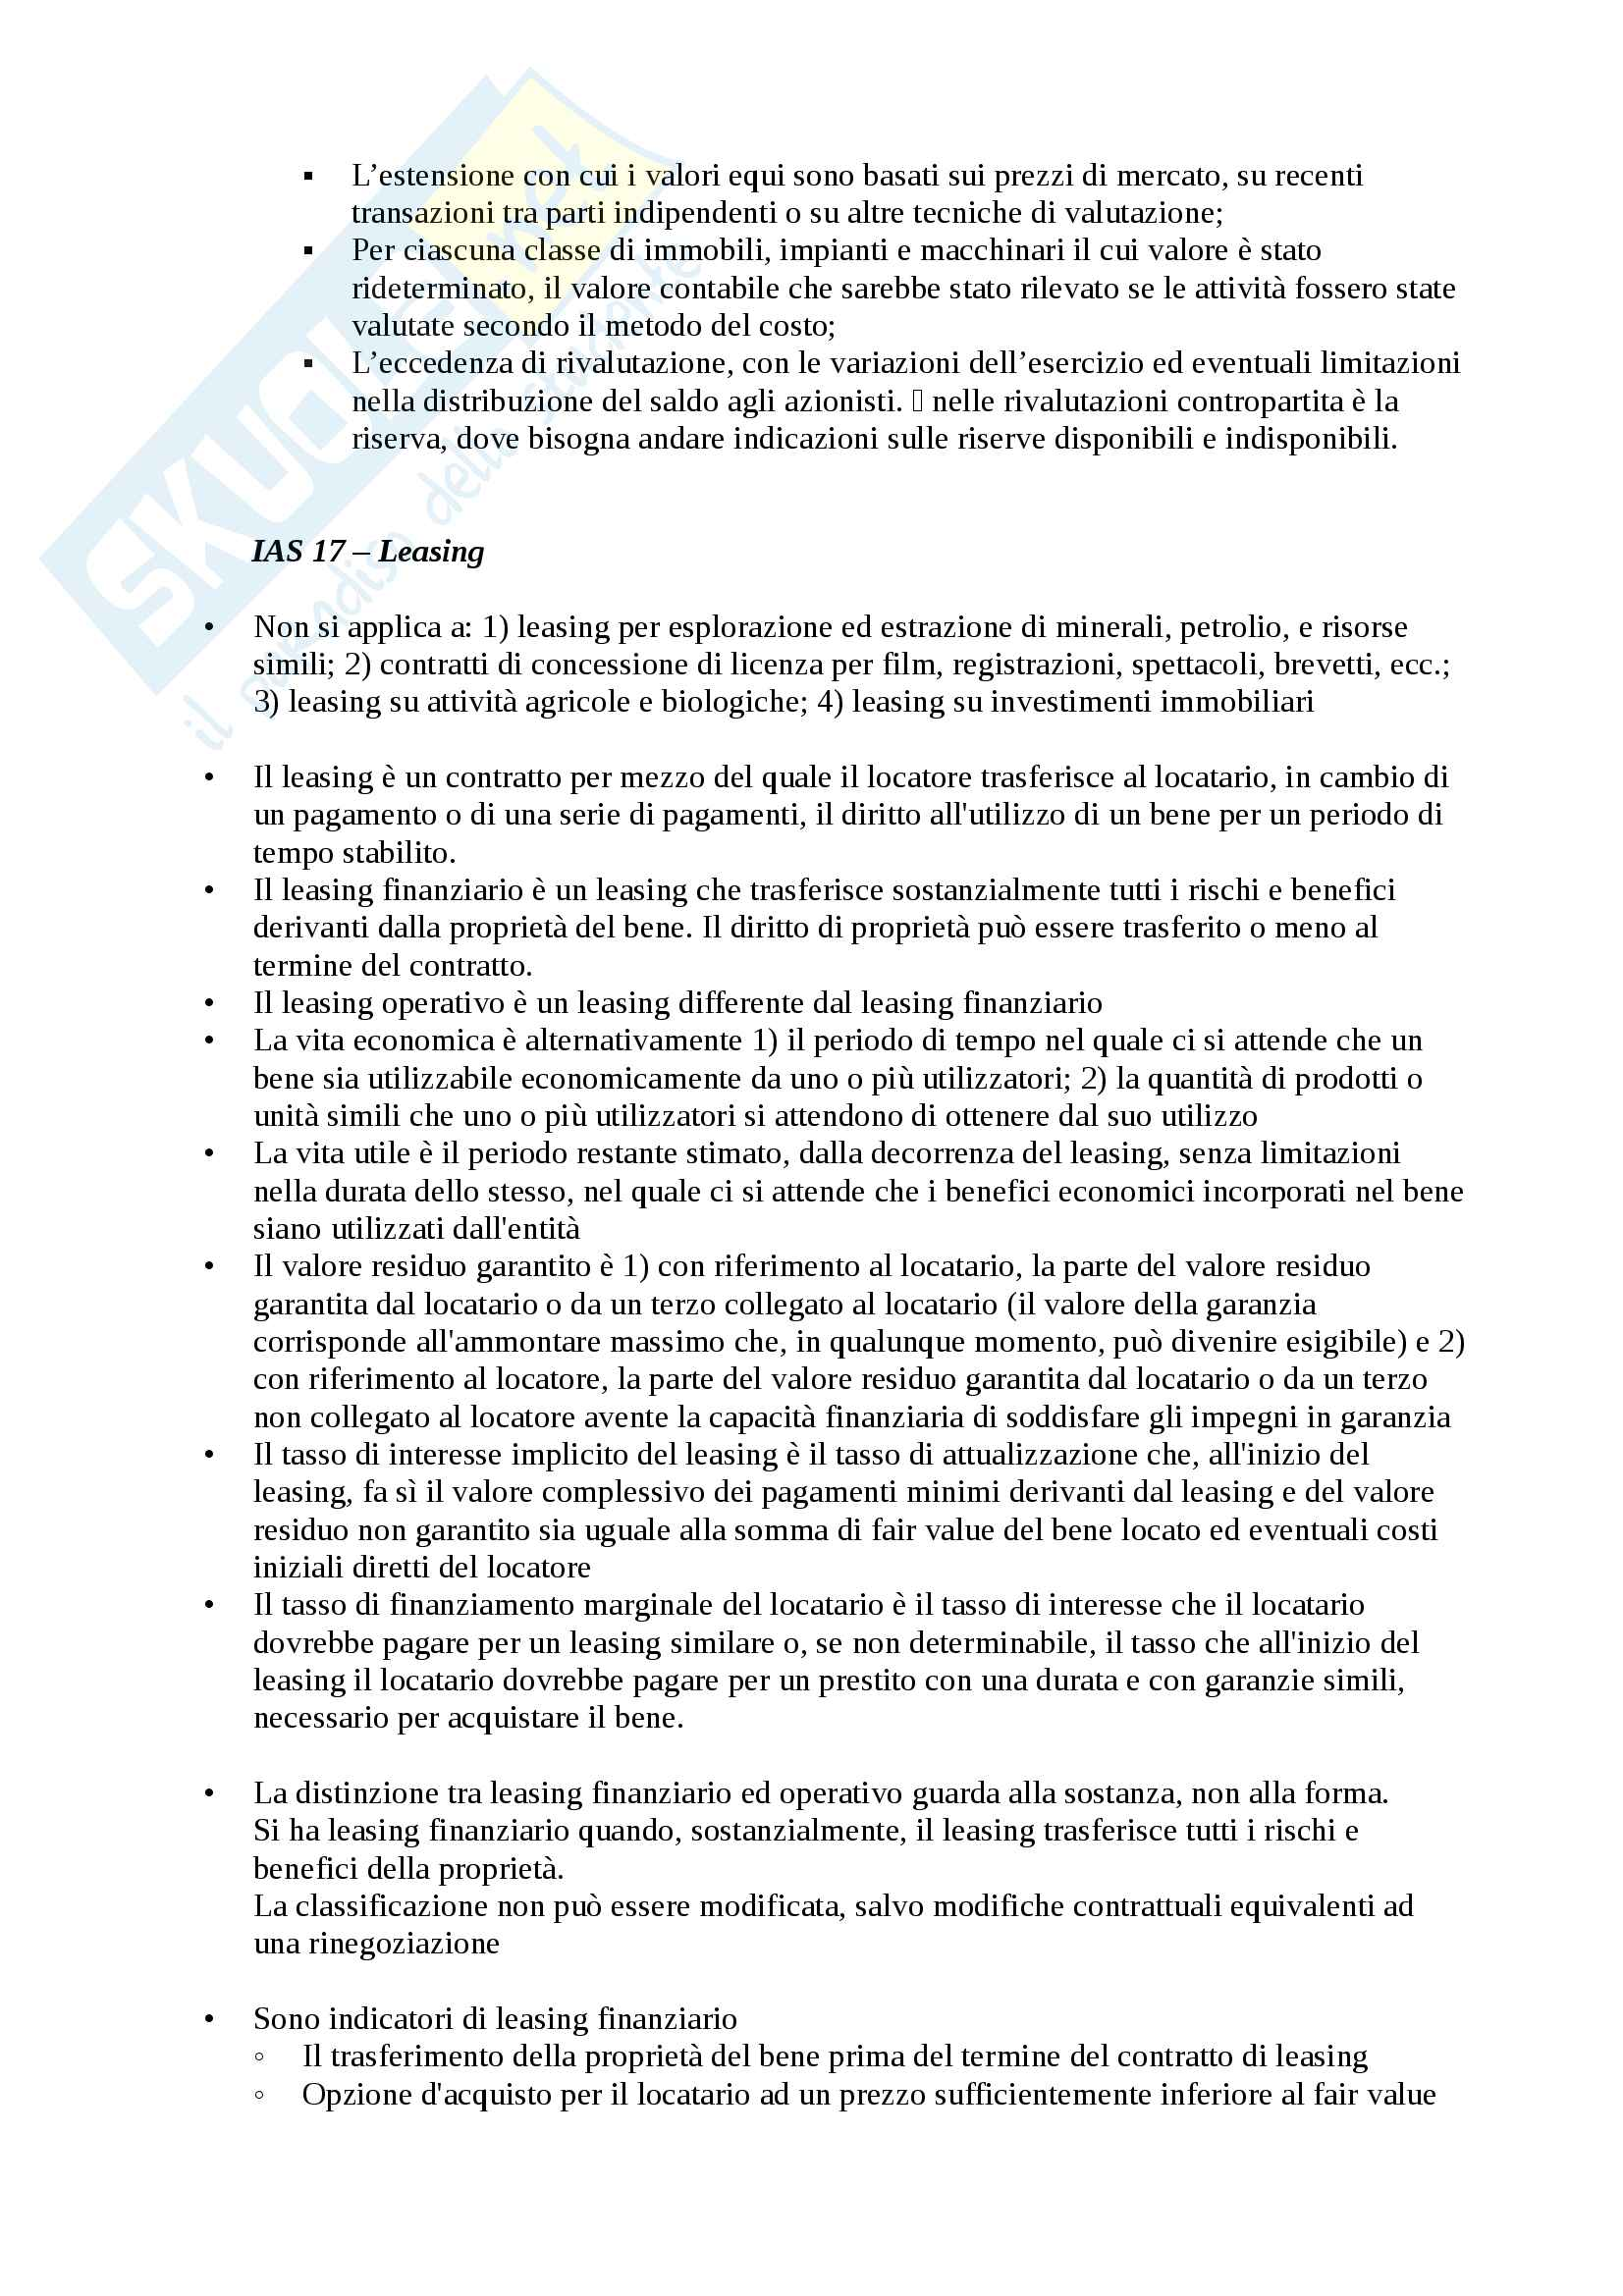 Sintesi schematica di International Accounting (Progredito) Pag. 11